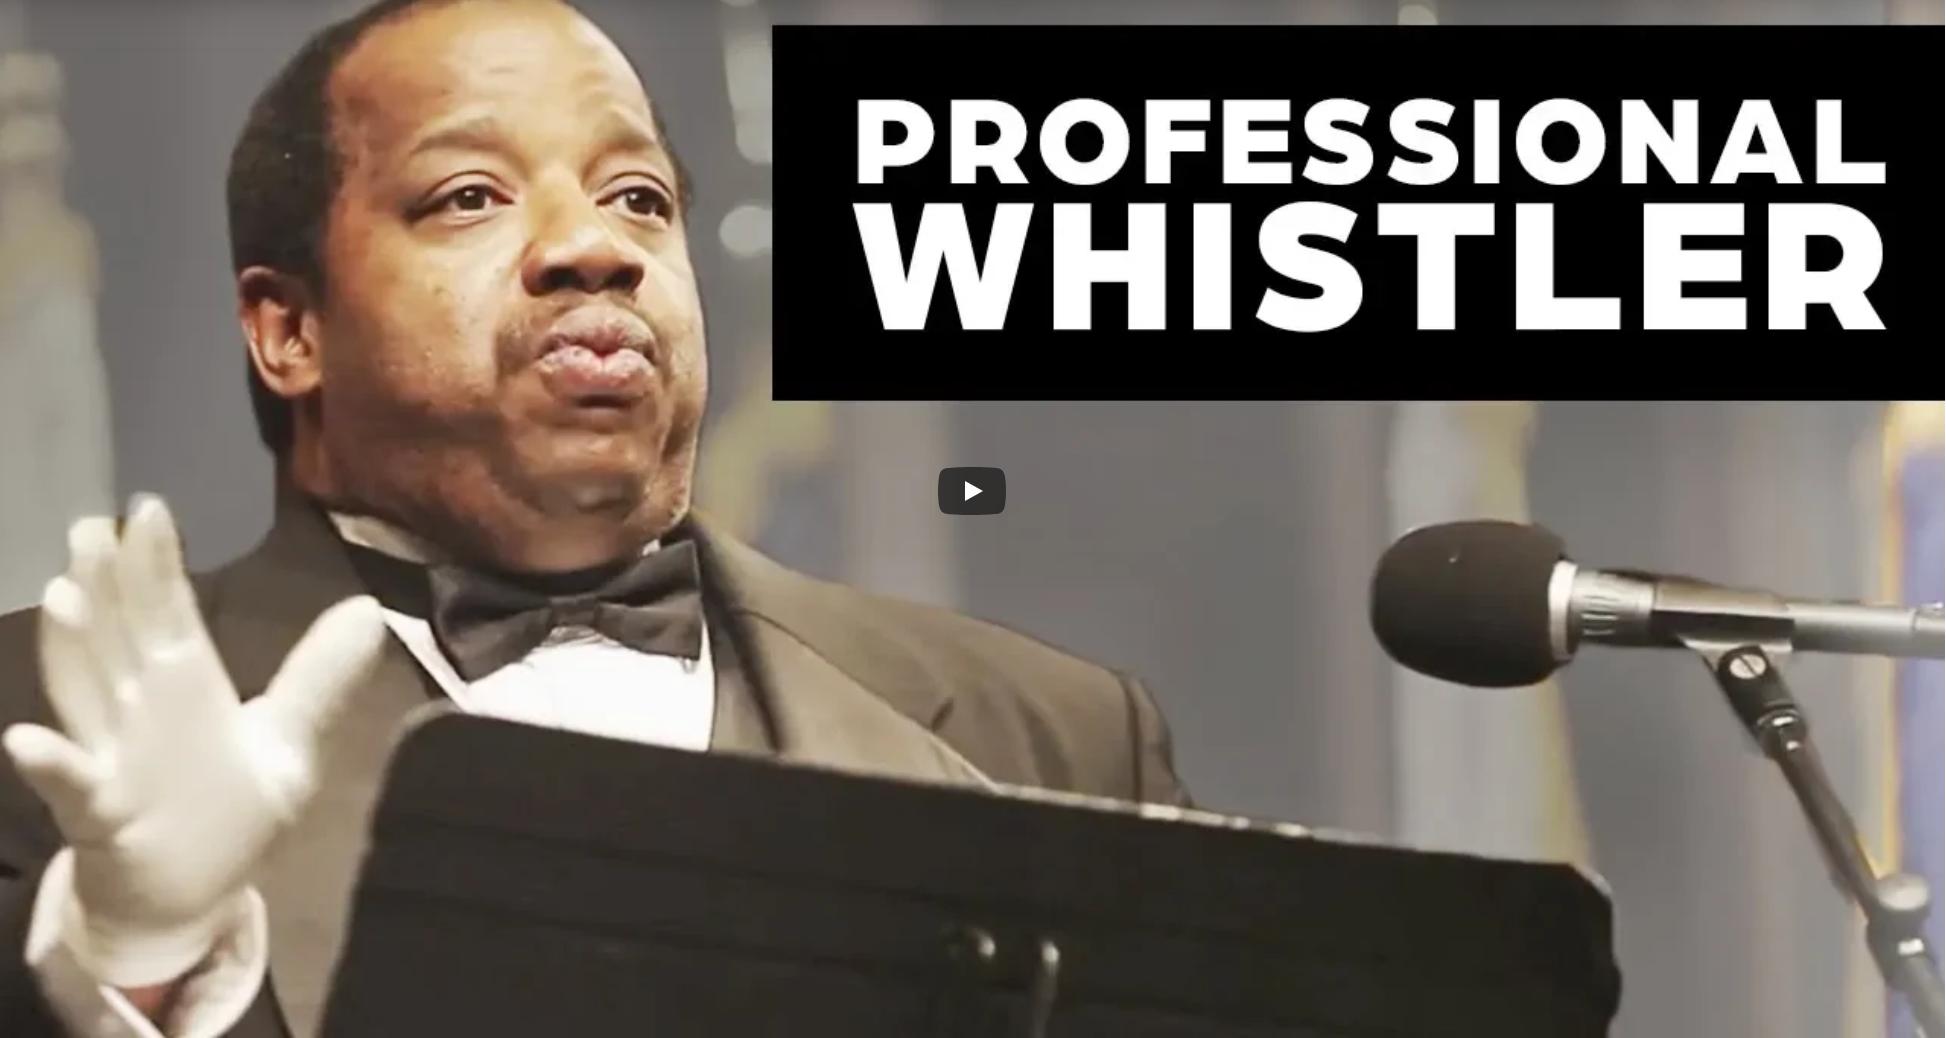 Professional Whistler